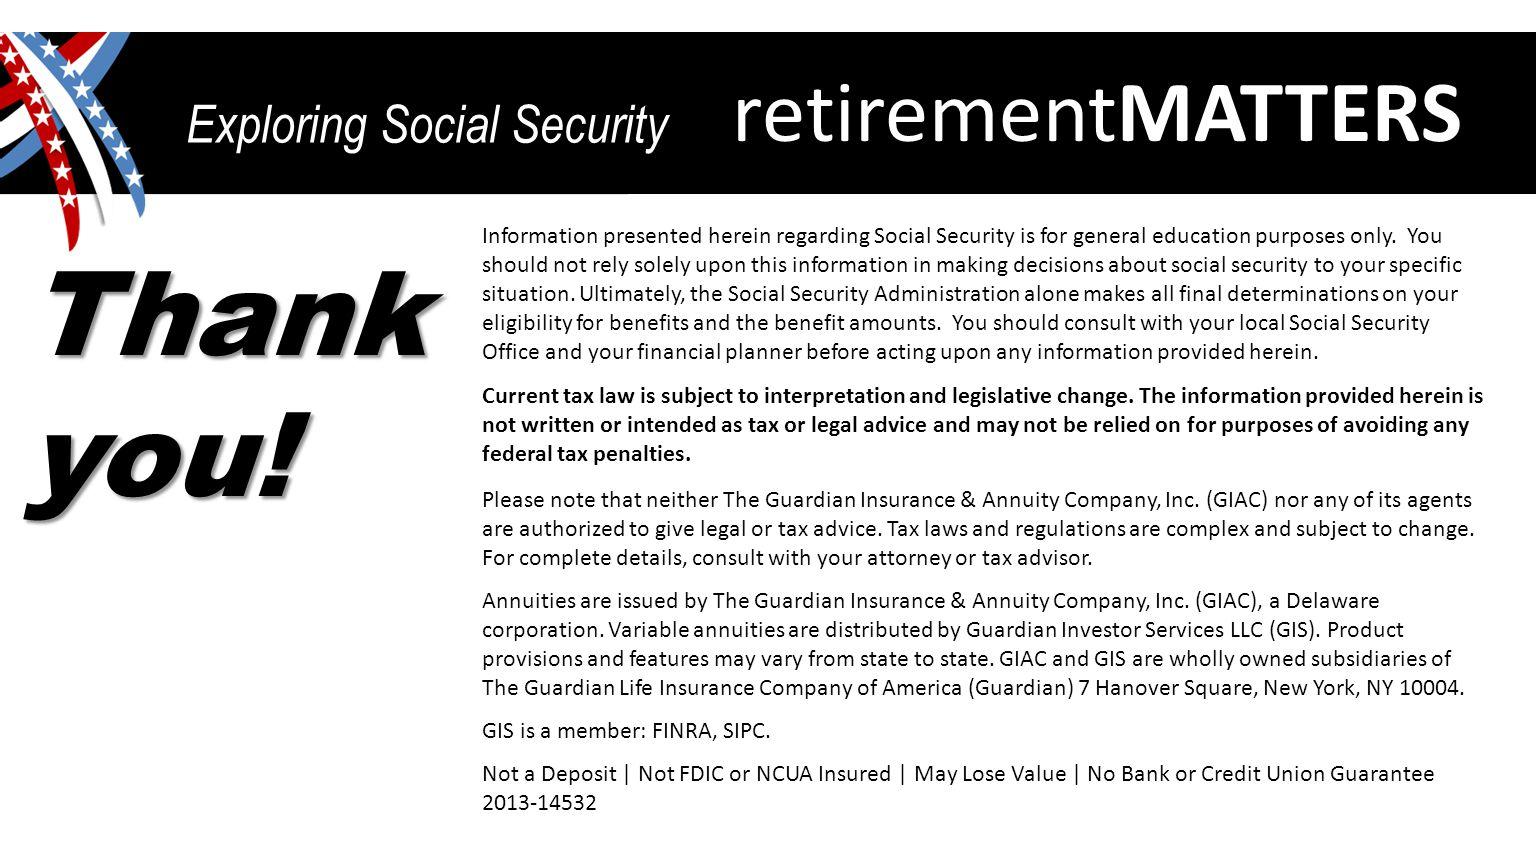 retirementMATTERS Exploring Social Security Thank you.